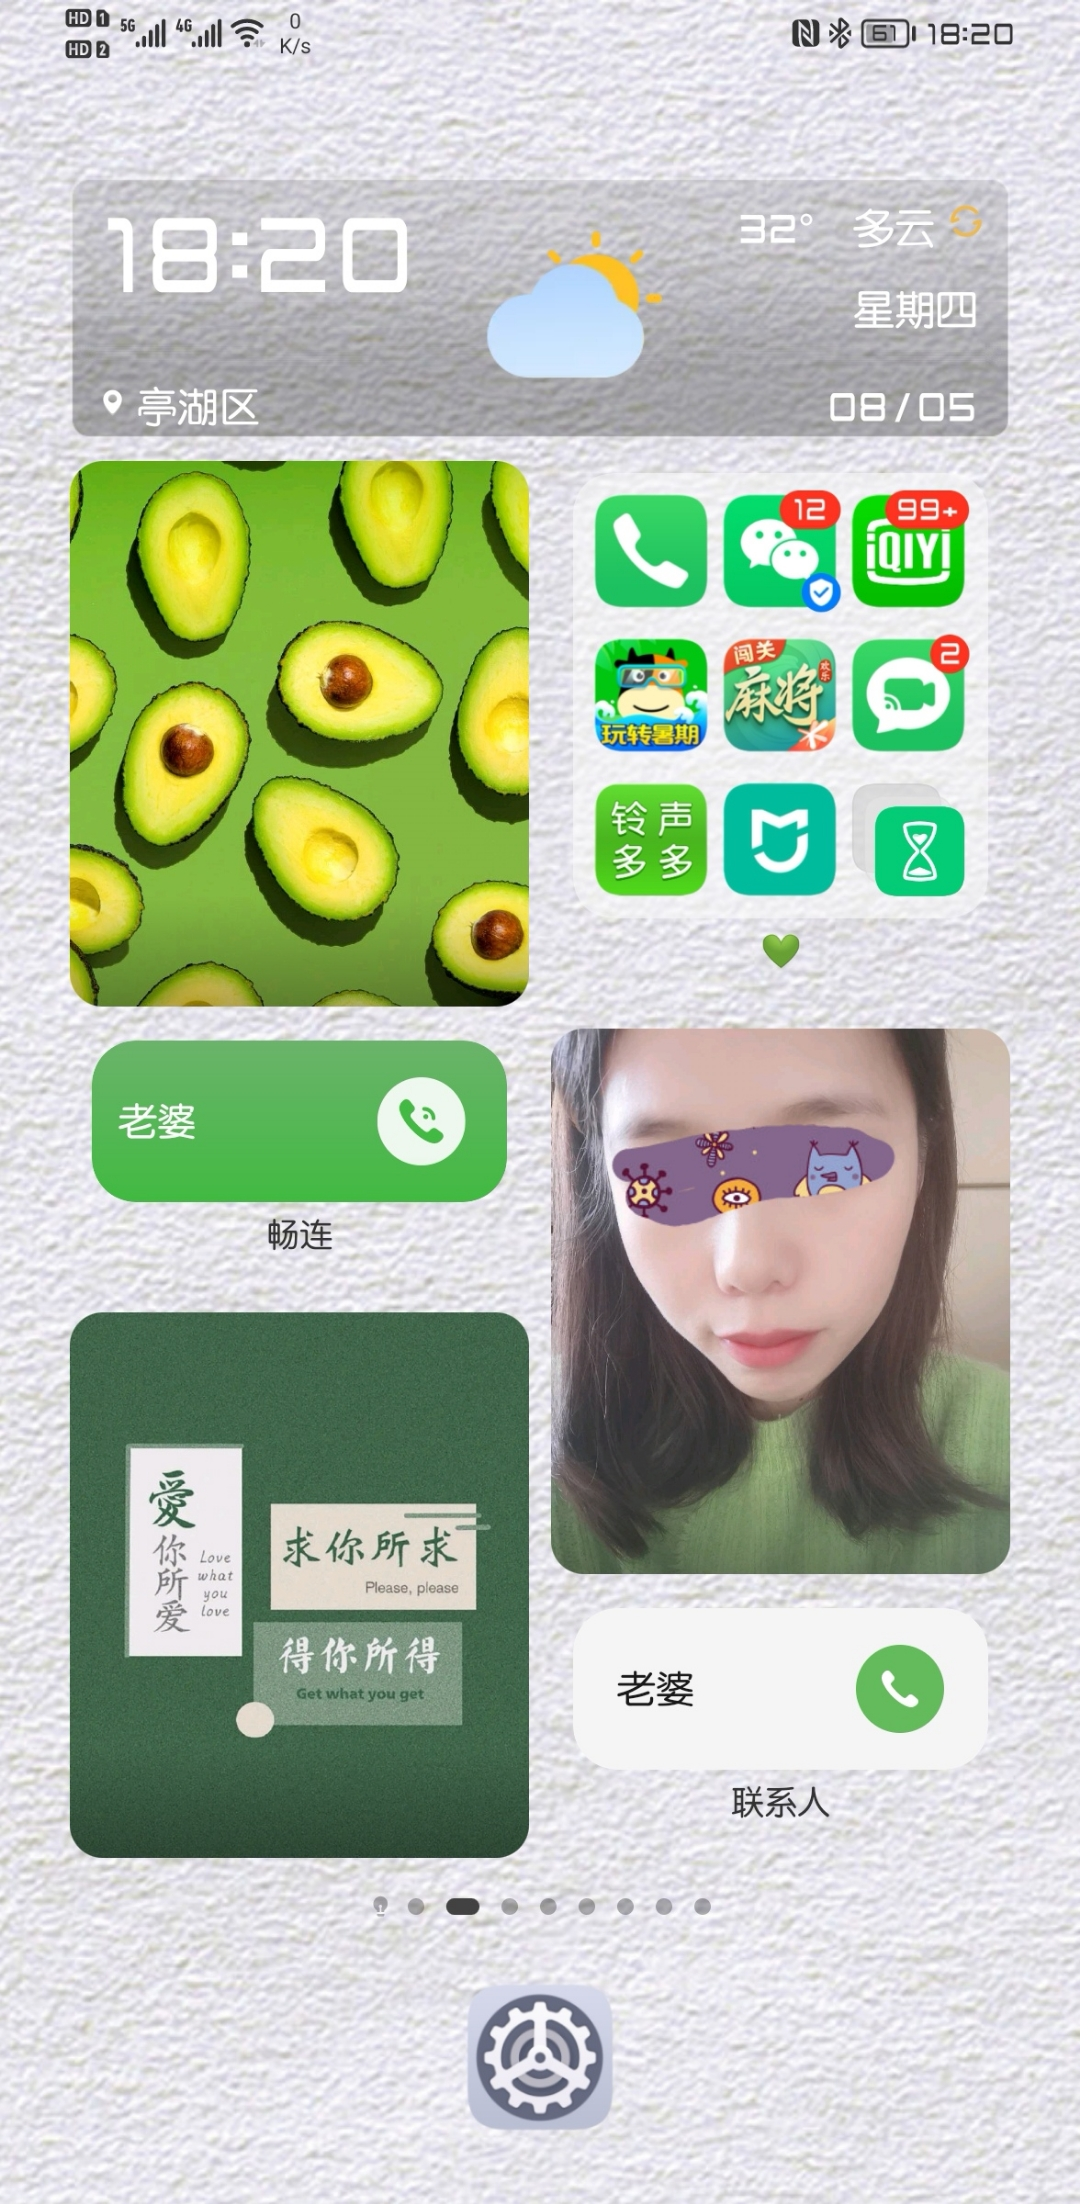 Screenshot_20210805_182029_com.huawei.android.launcher_edit_726904051398457.jpg